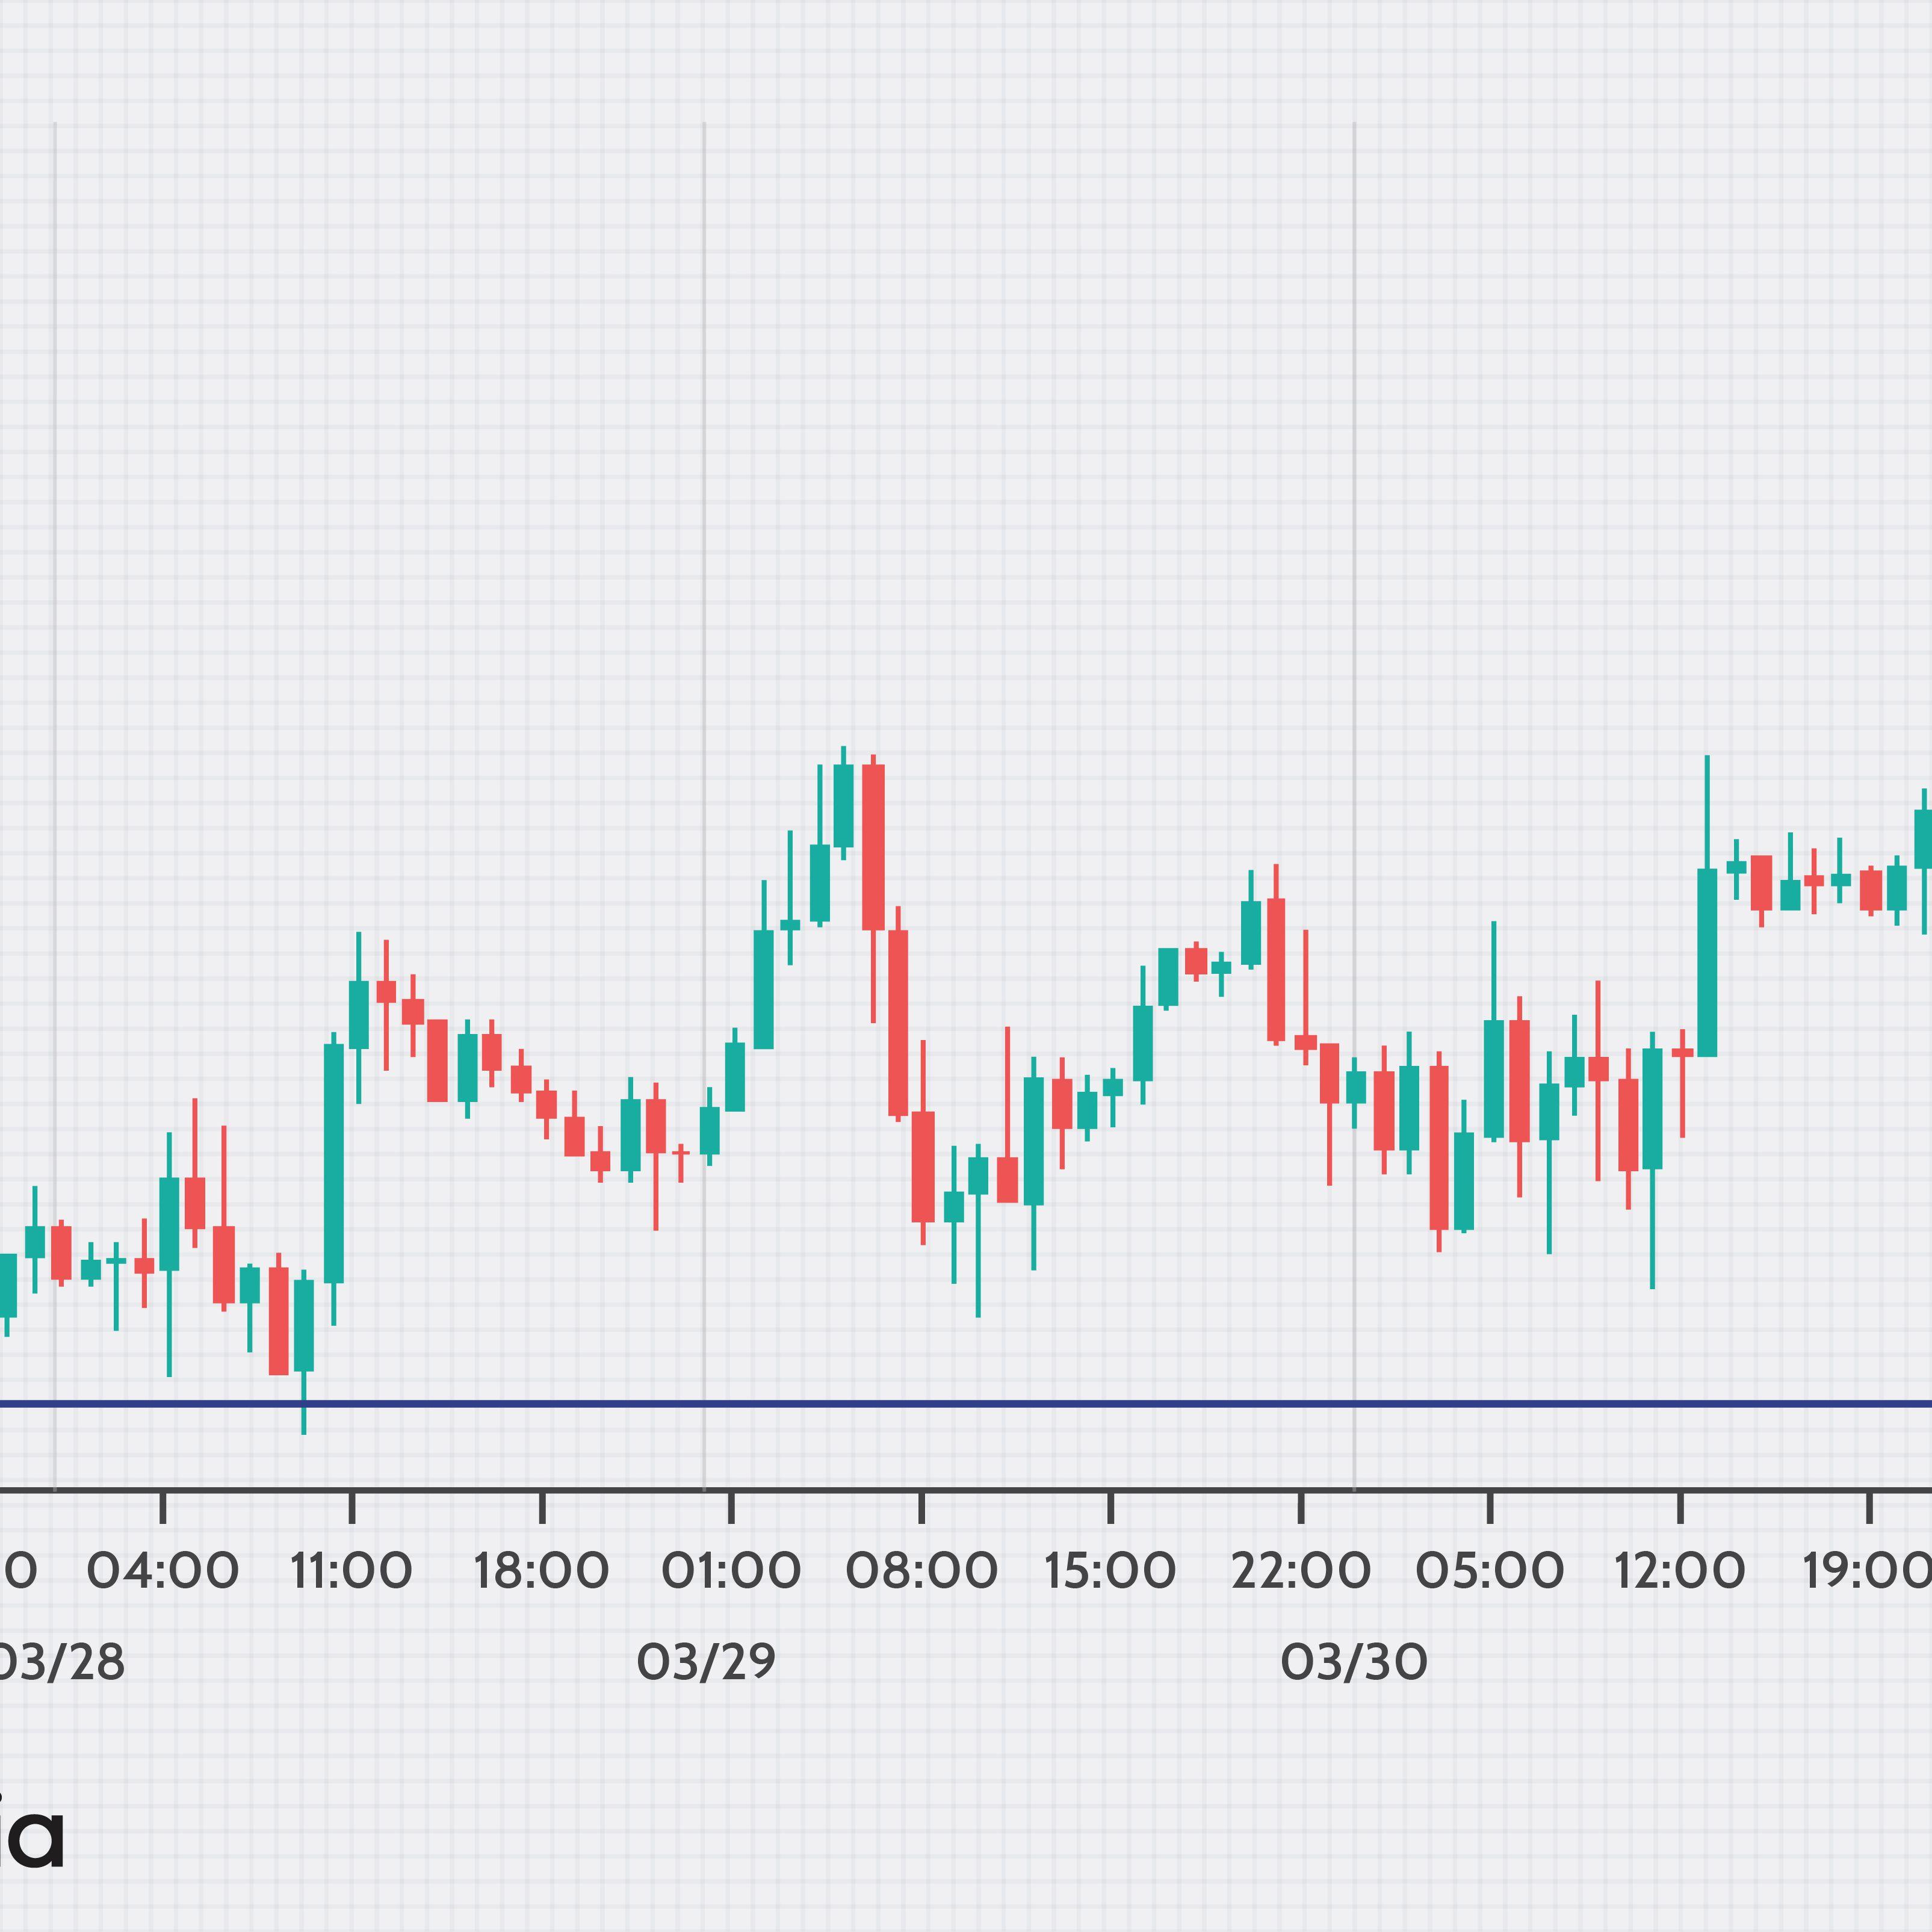 Gdp price index investopedia forex sparen forex